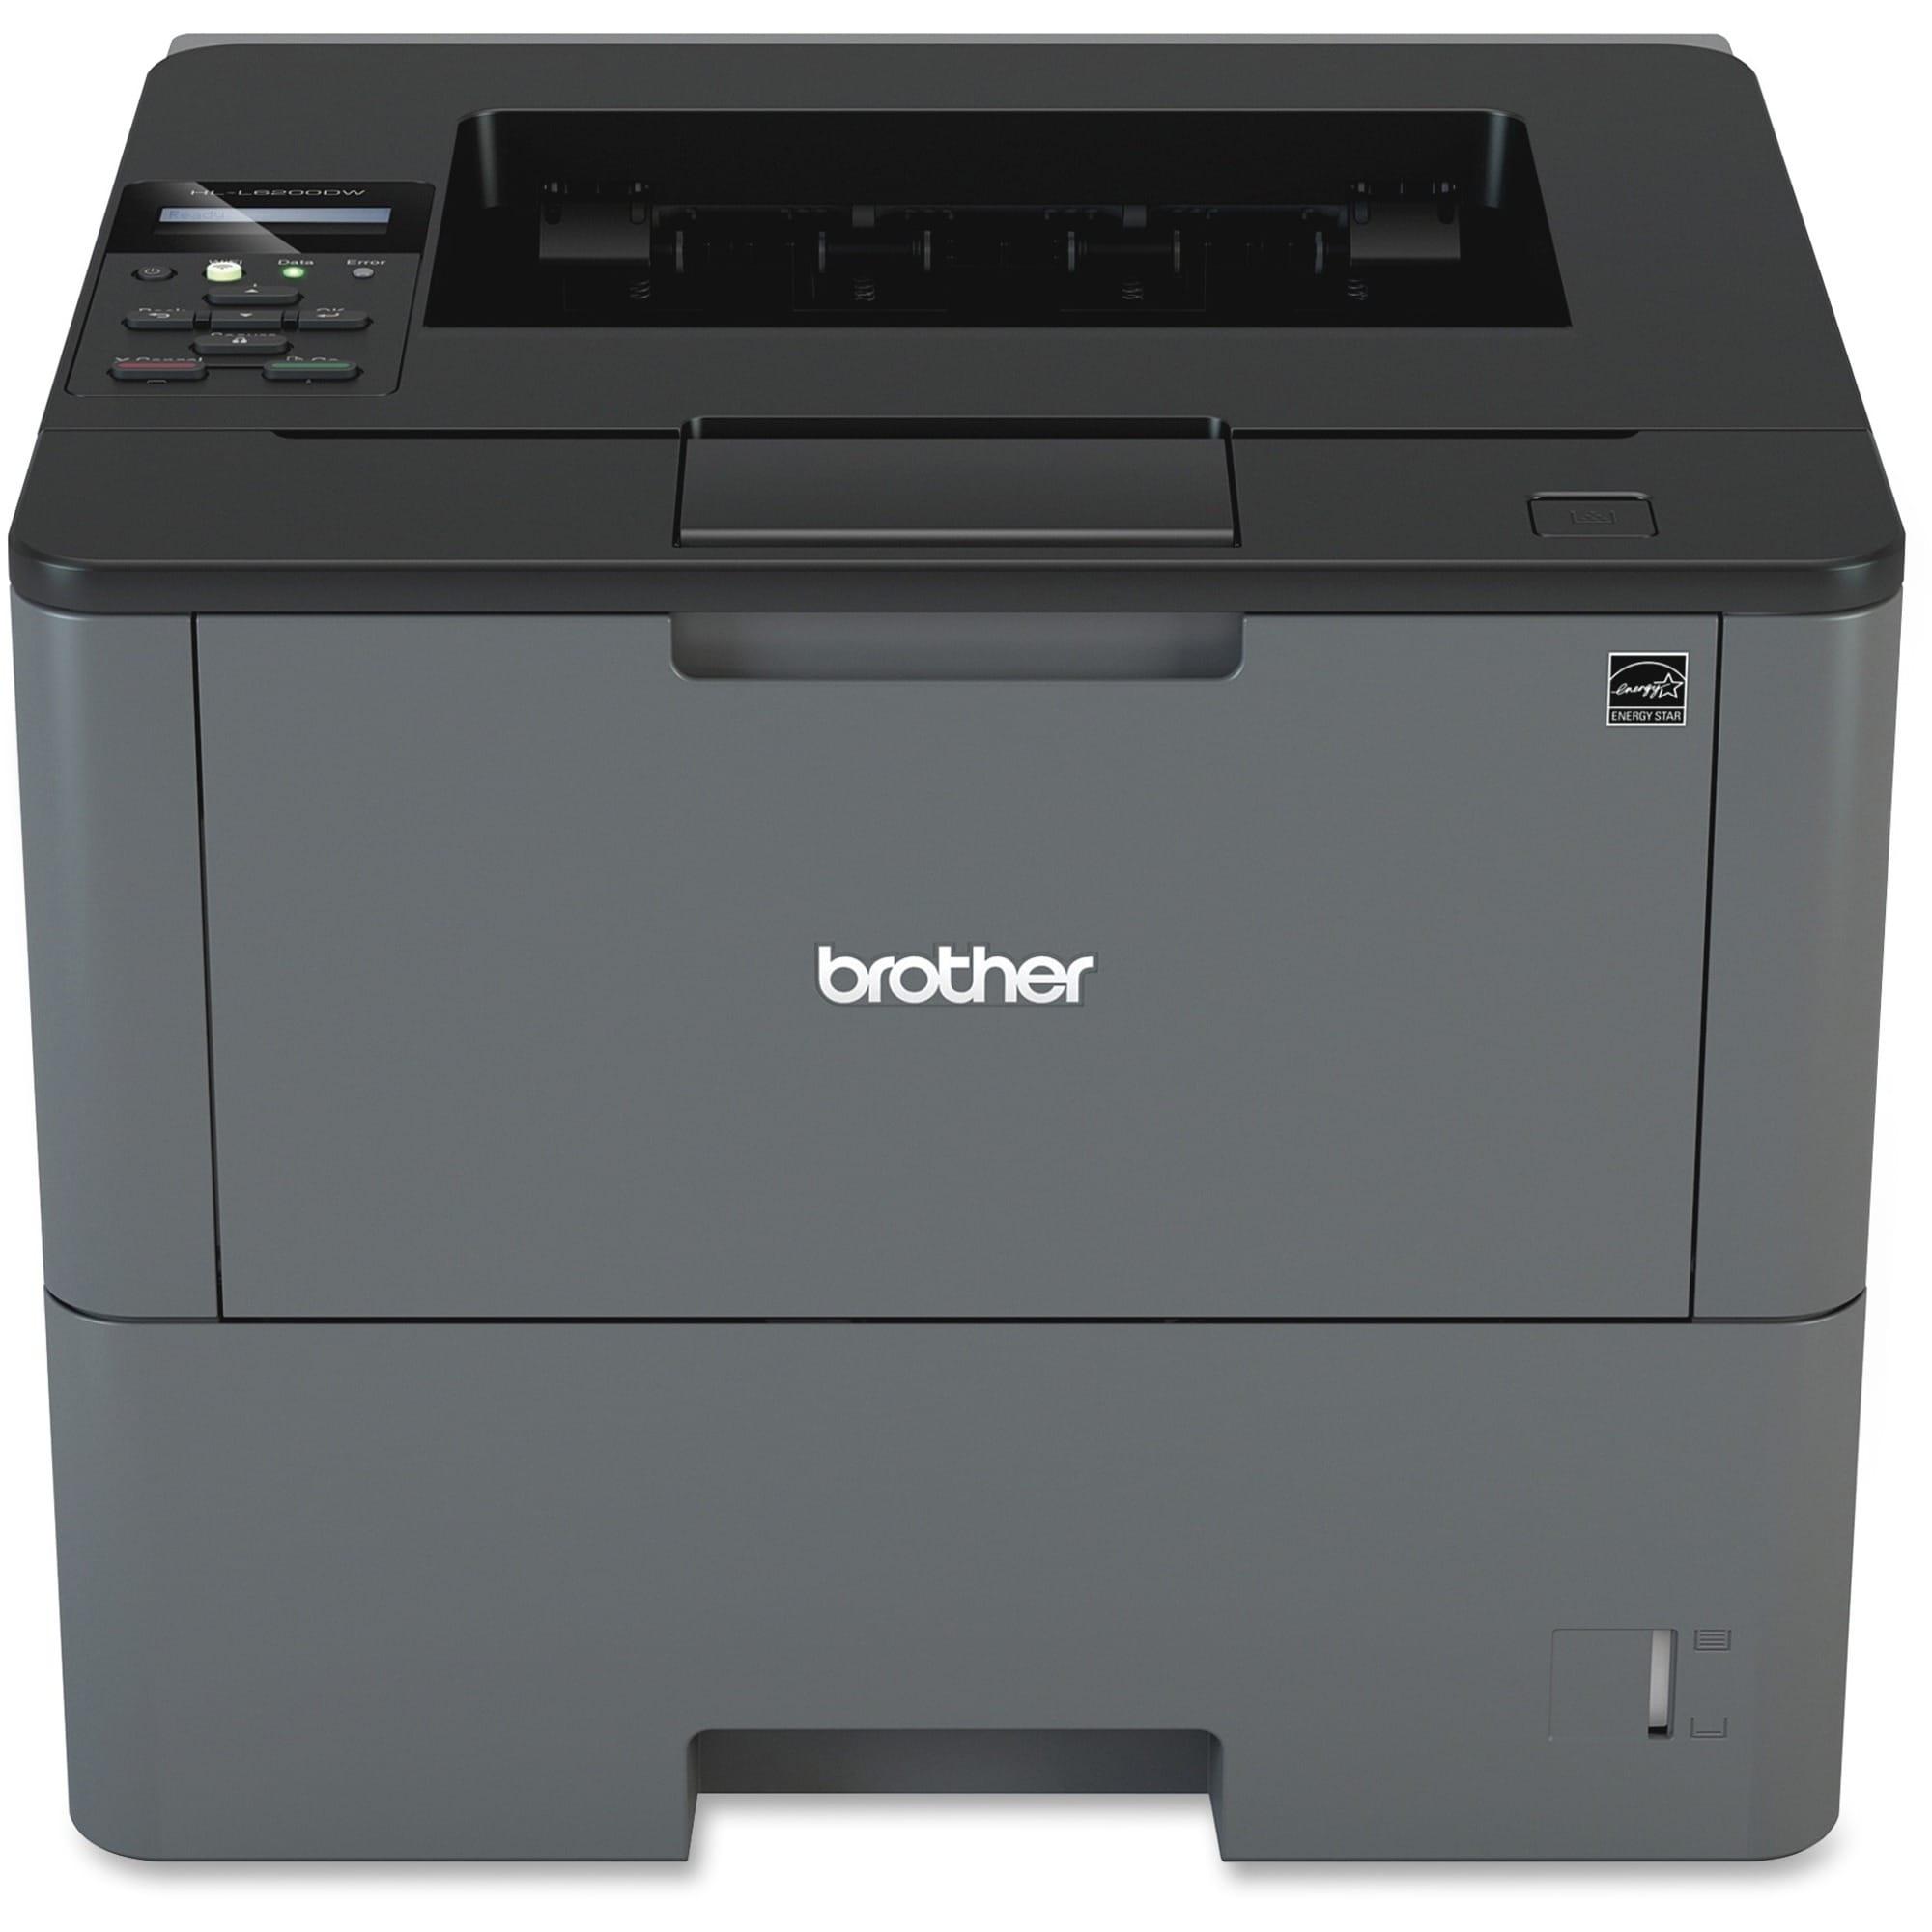 Brother Business Laser Printer HL-L6200DW - Monochrome - Duplex